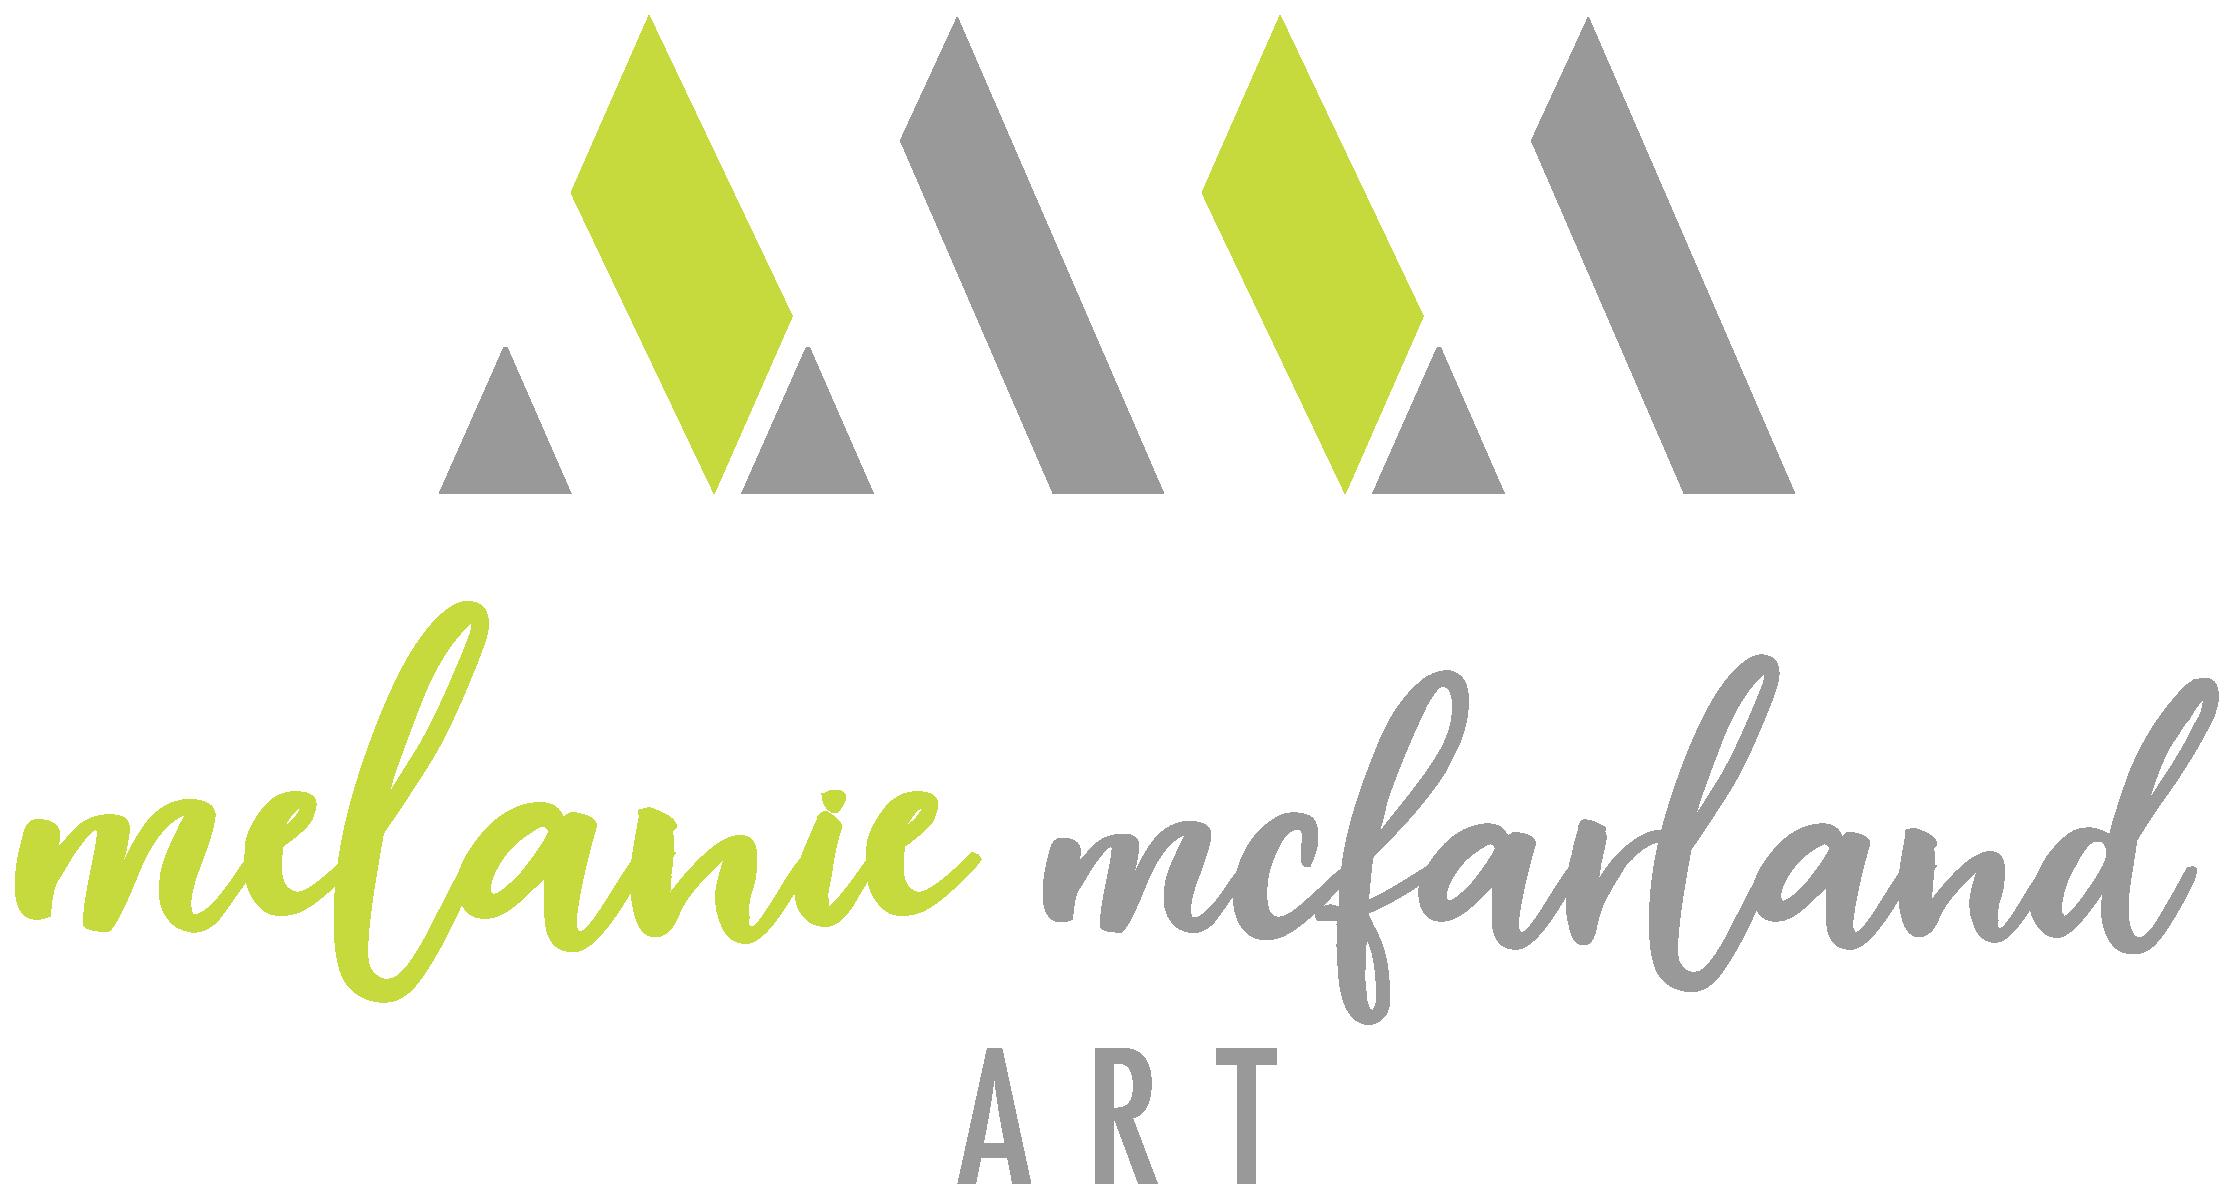 Melanie McFarland